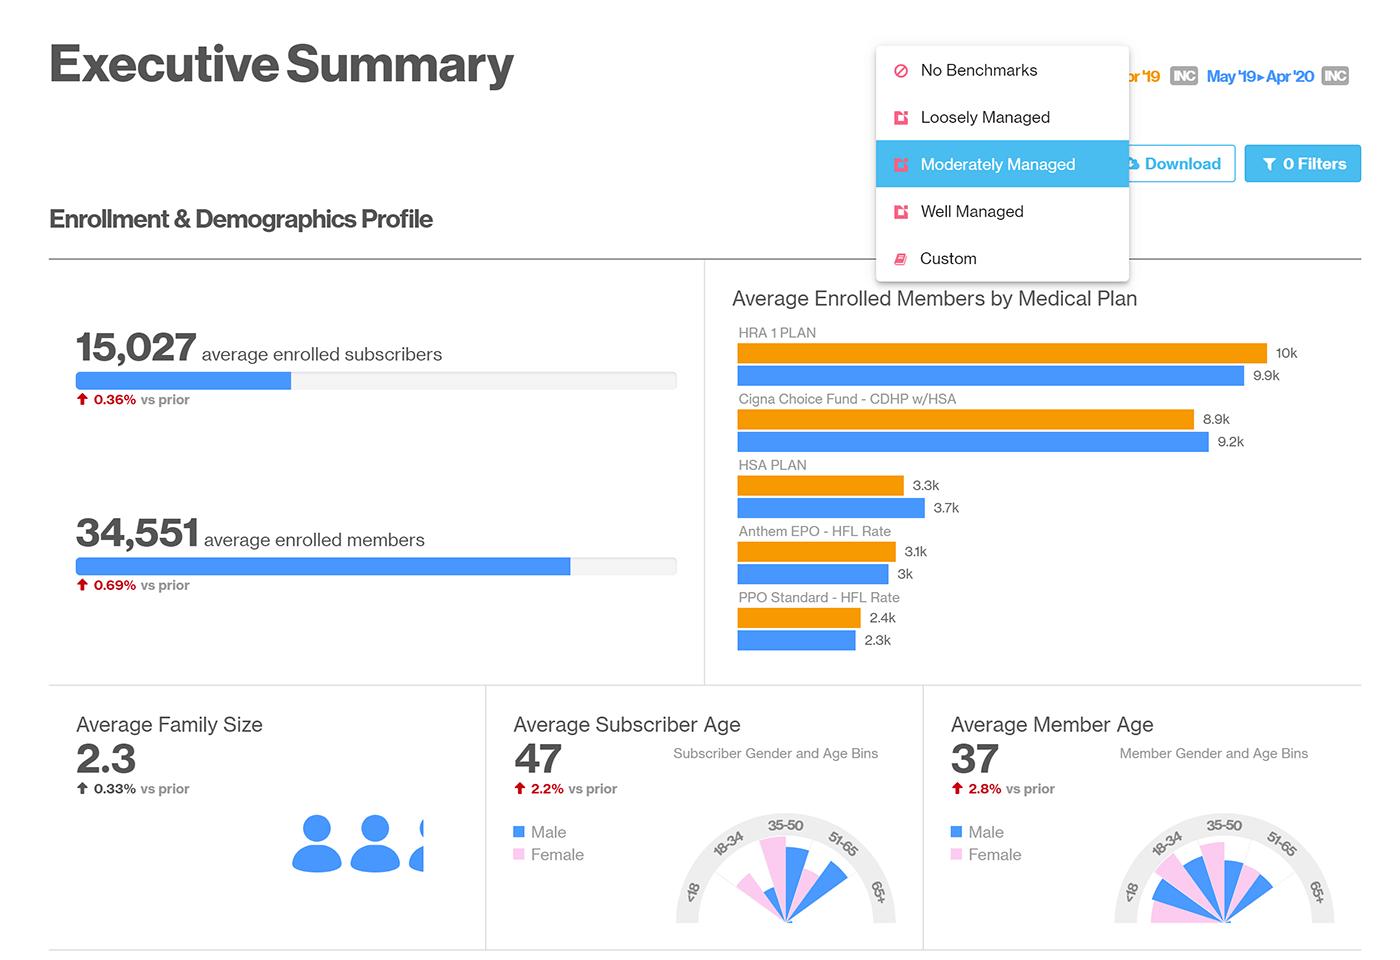 Screenshot of Artemis Health Executive Summary report with bencmarking built in.